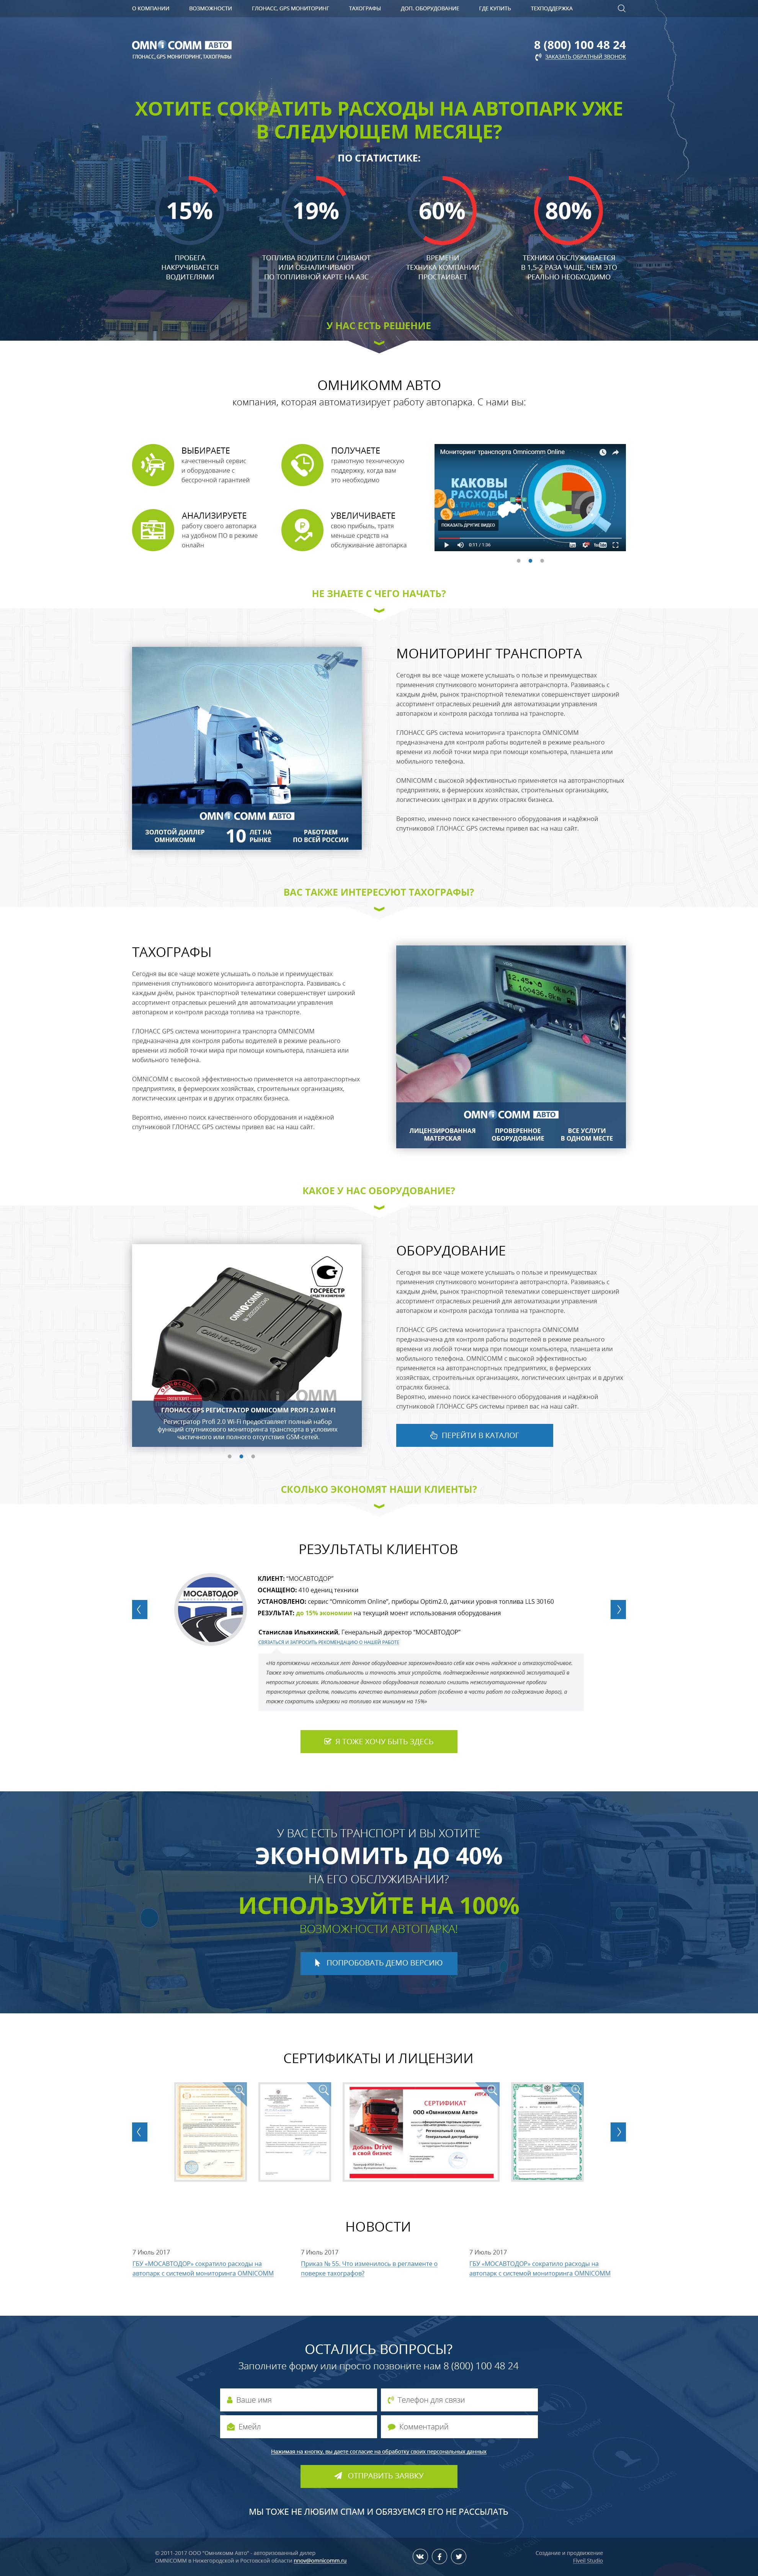 OmniComm - ГЛОНАСС, GPS мониторинг, тахографы